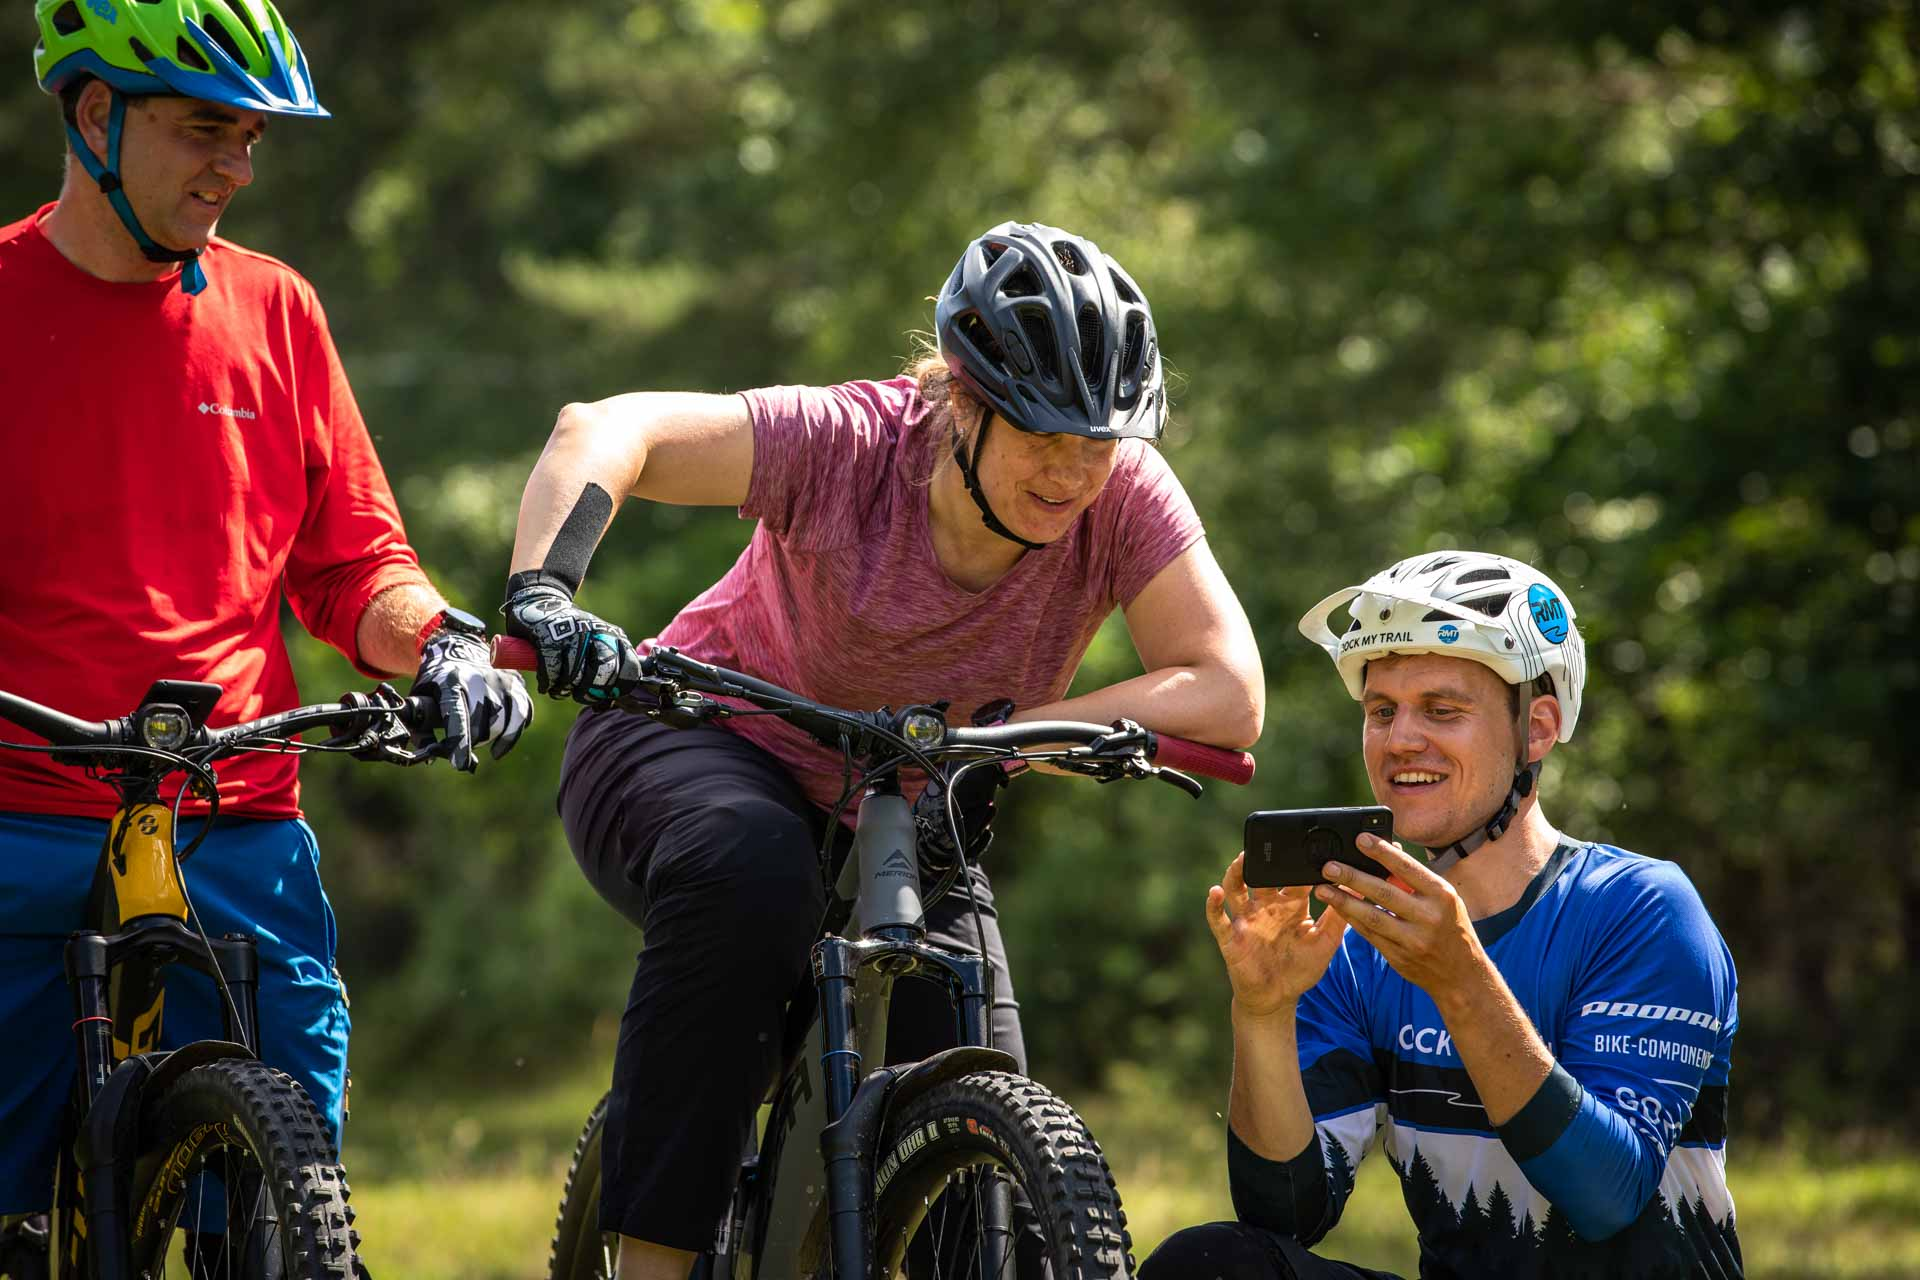 eMTB Fortgeschritten Fahrtechnik Kurs in Kassel - Rock my Trail Bikeschule